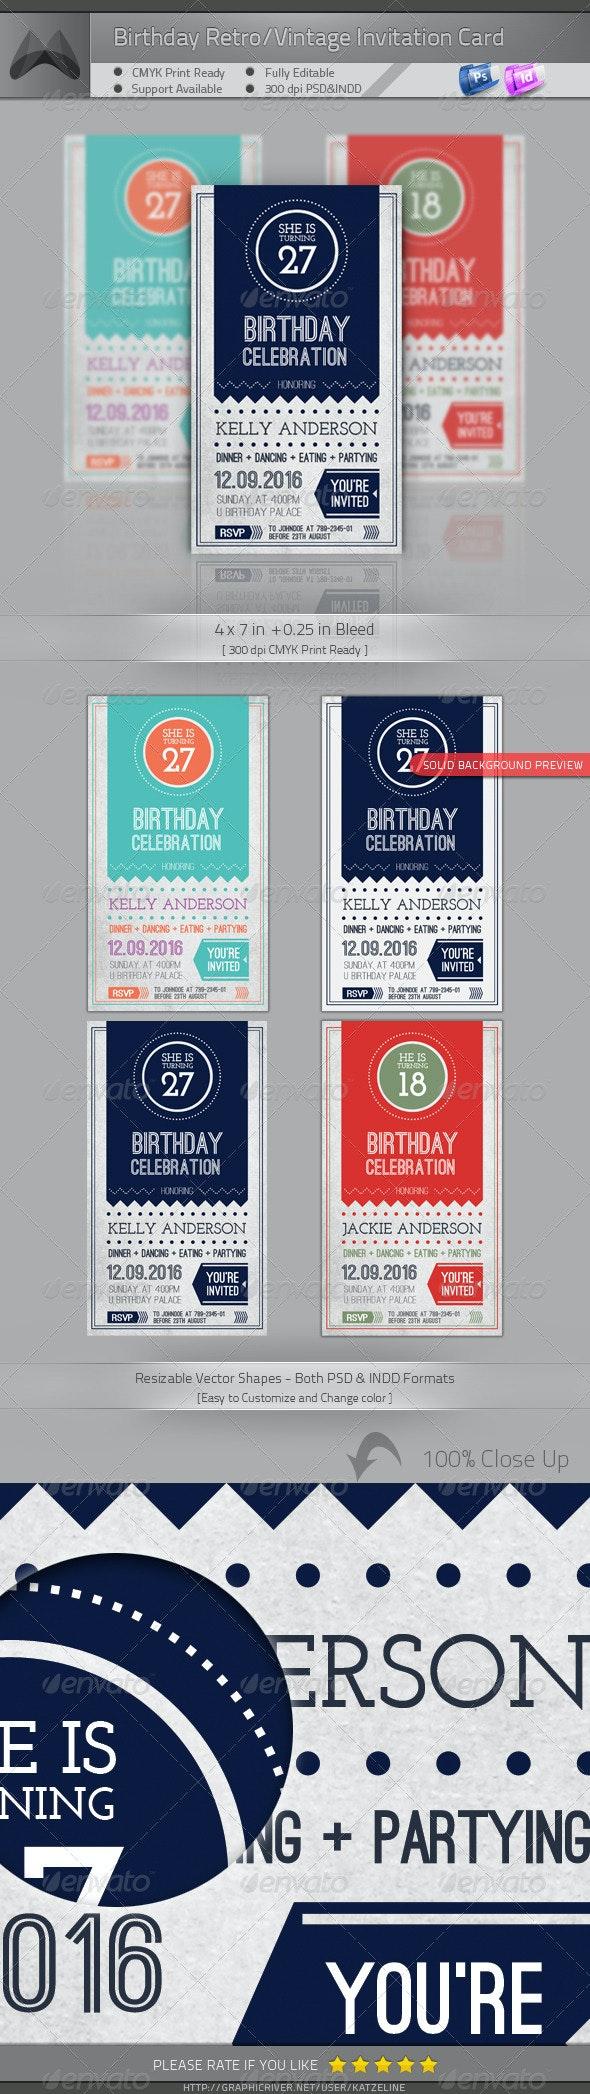 Birthday Retro/Vintage Invitation - Invitations Cards & Invites